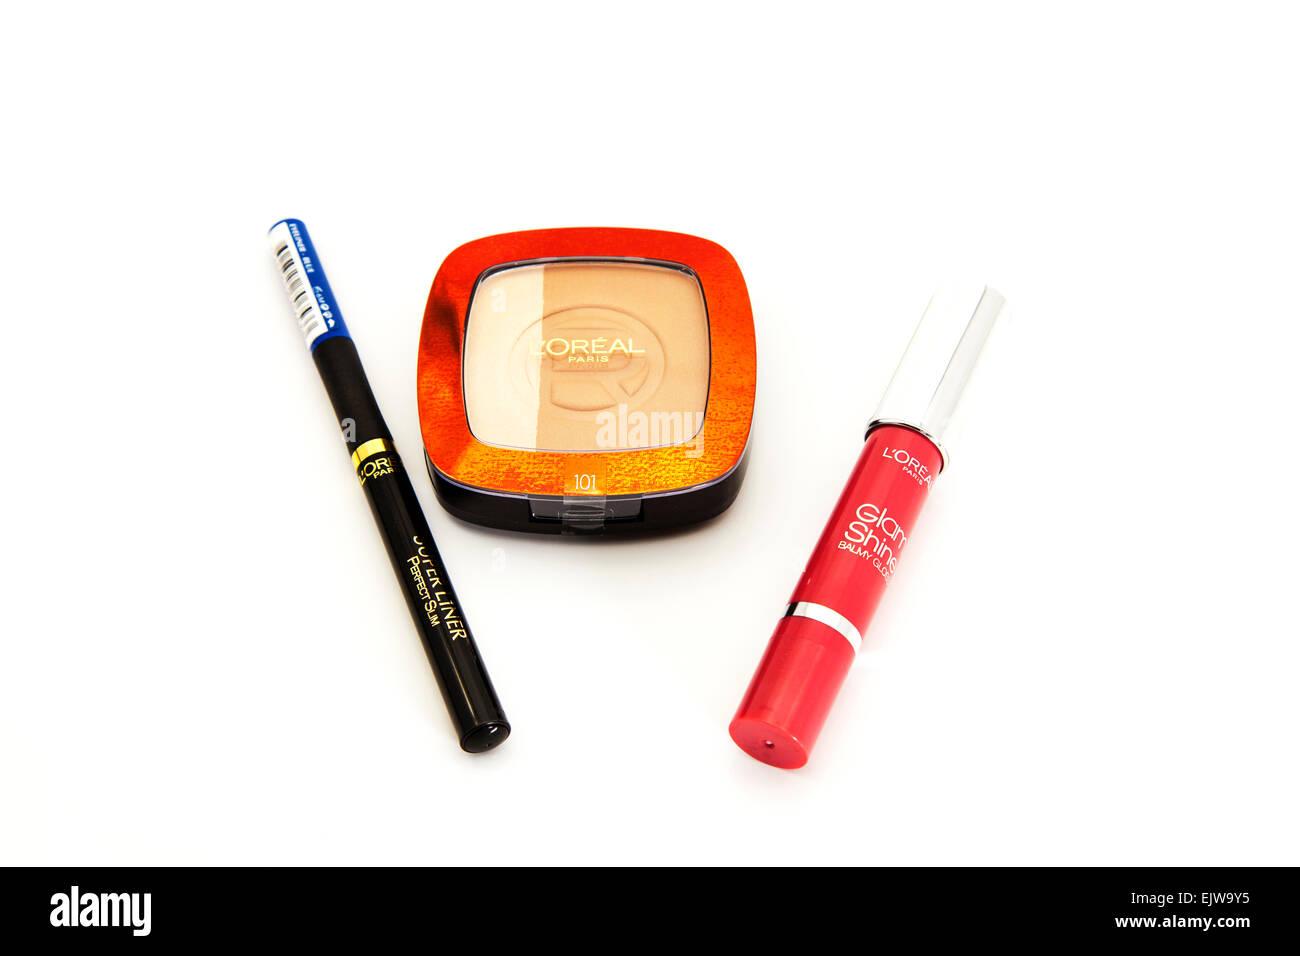 Loreal Paris Kosmetik Lipgloss Eyeliner Bronzer Puder Wimperntusche Produkte isoliert Ausschnitt ausschneiden auf Stockbild